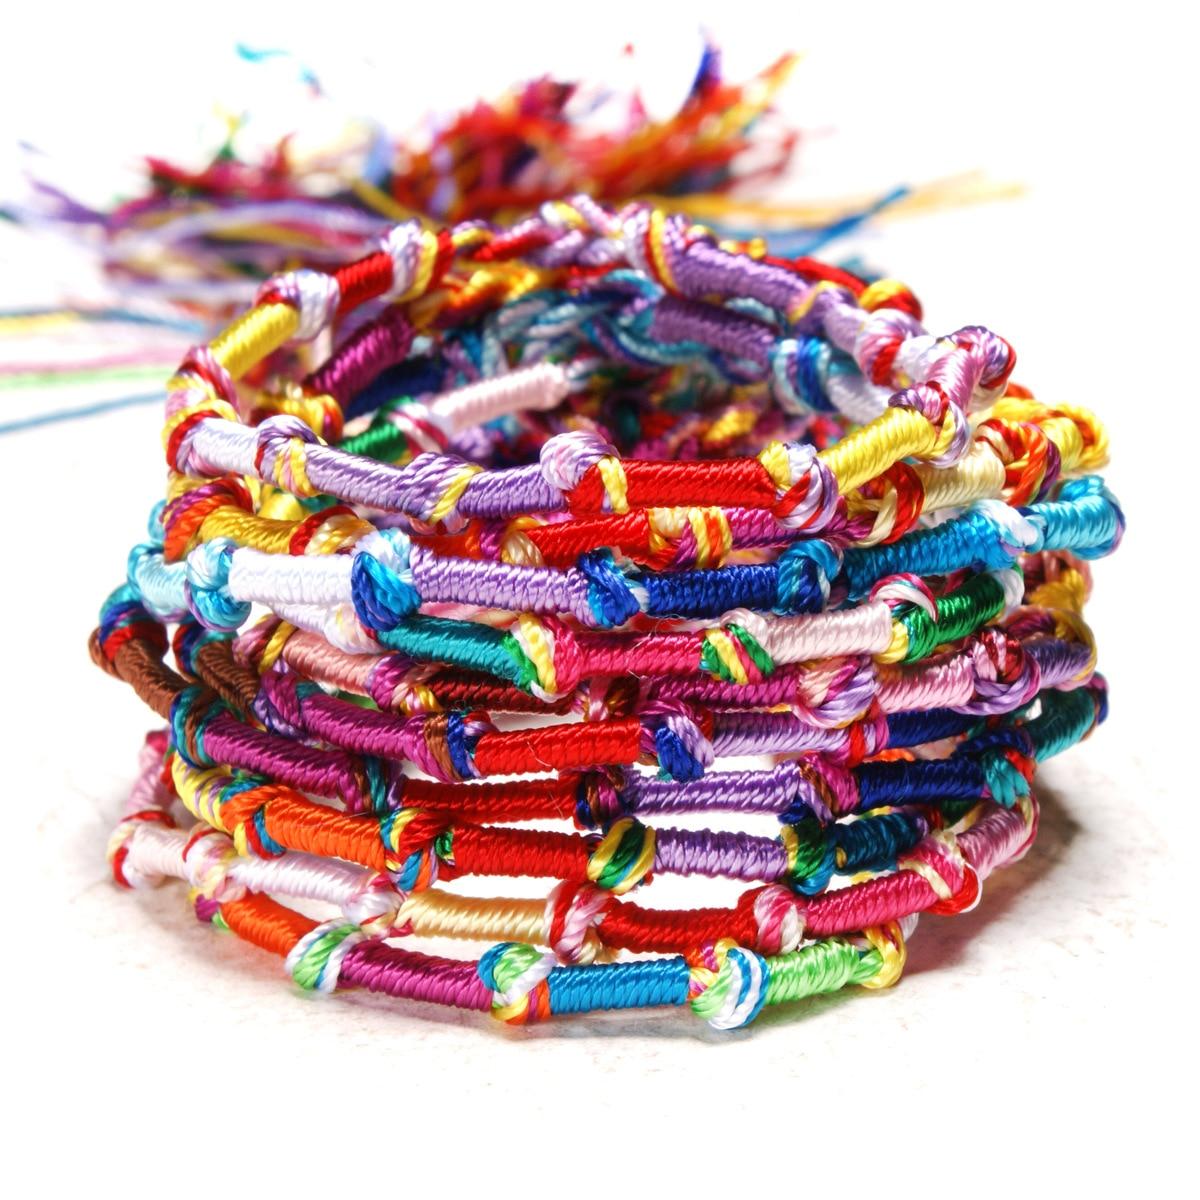 10pc Colorful Woven Braided Friendship Bracelet Handmade Brazilian String Cotton Cord Hippie Surf Men Women Jewelry Gift 1